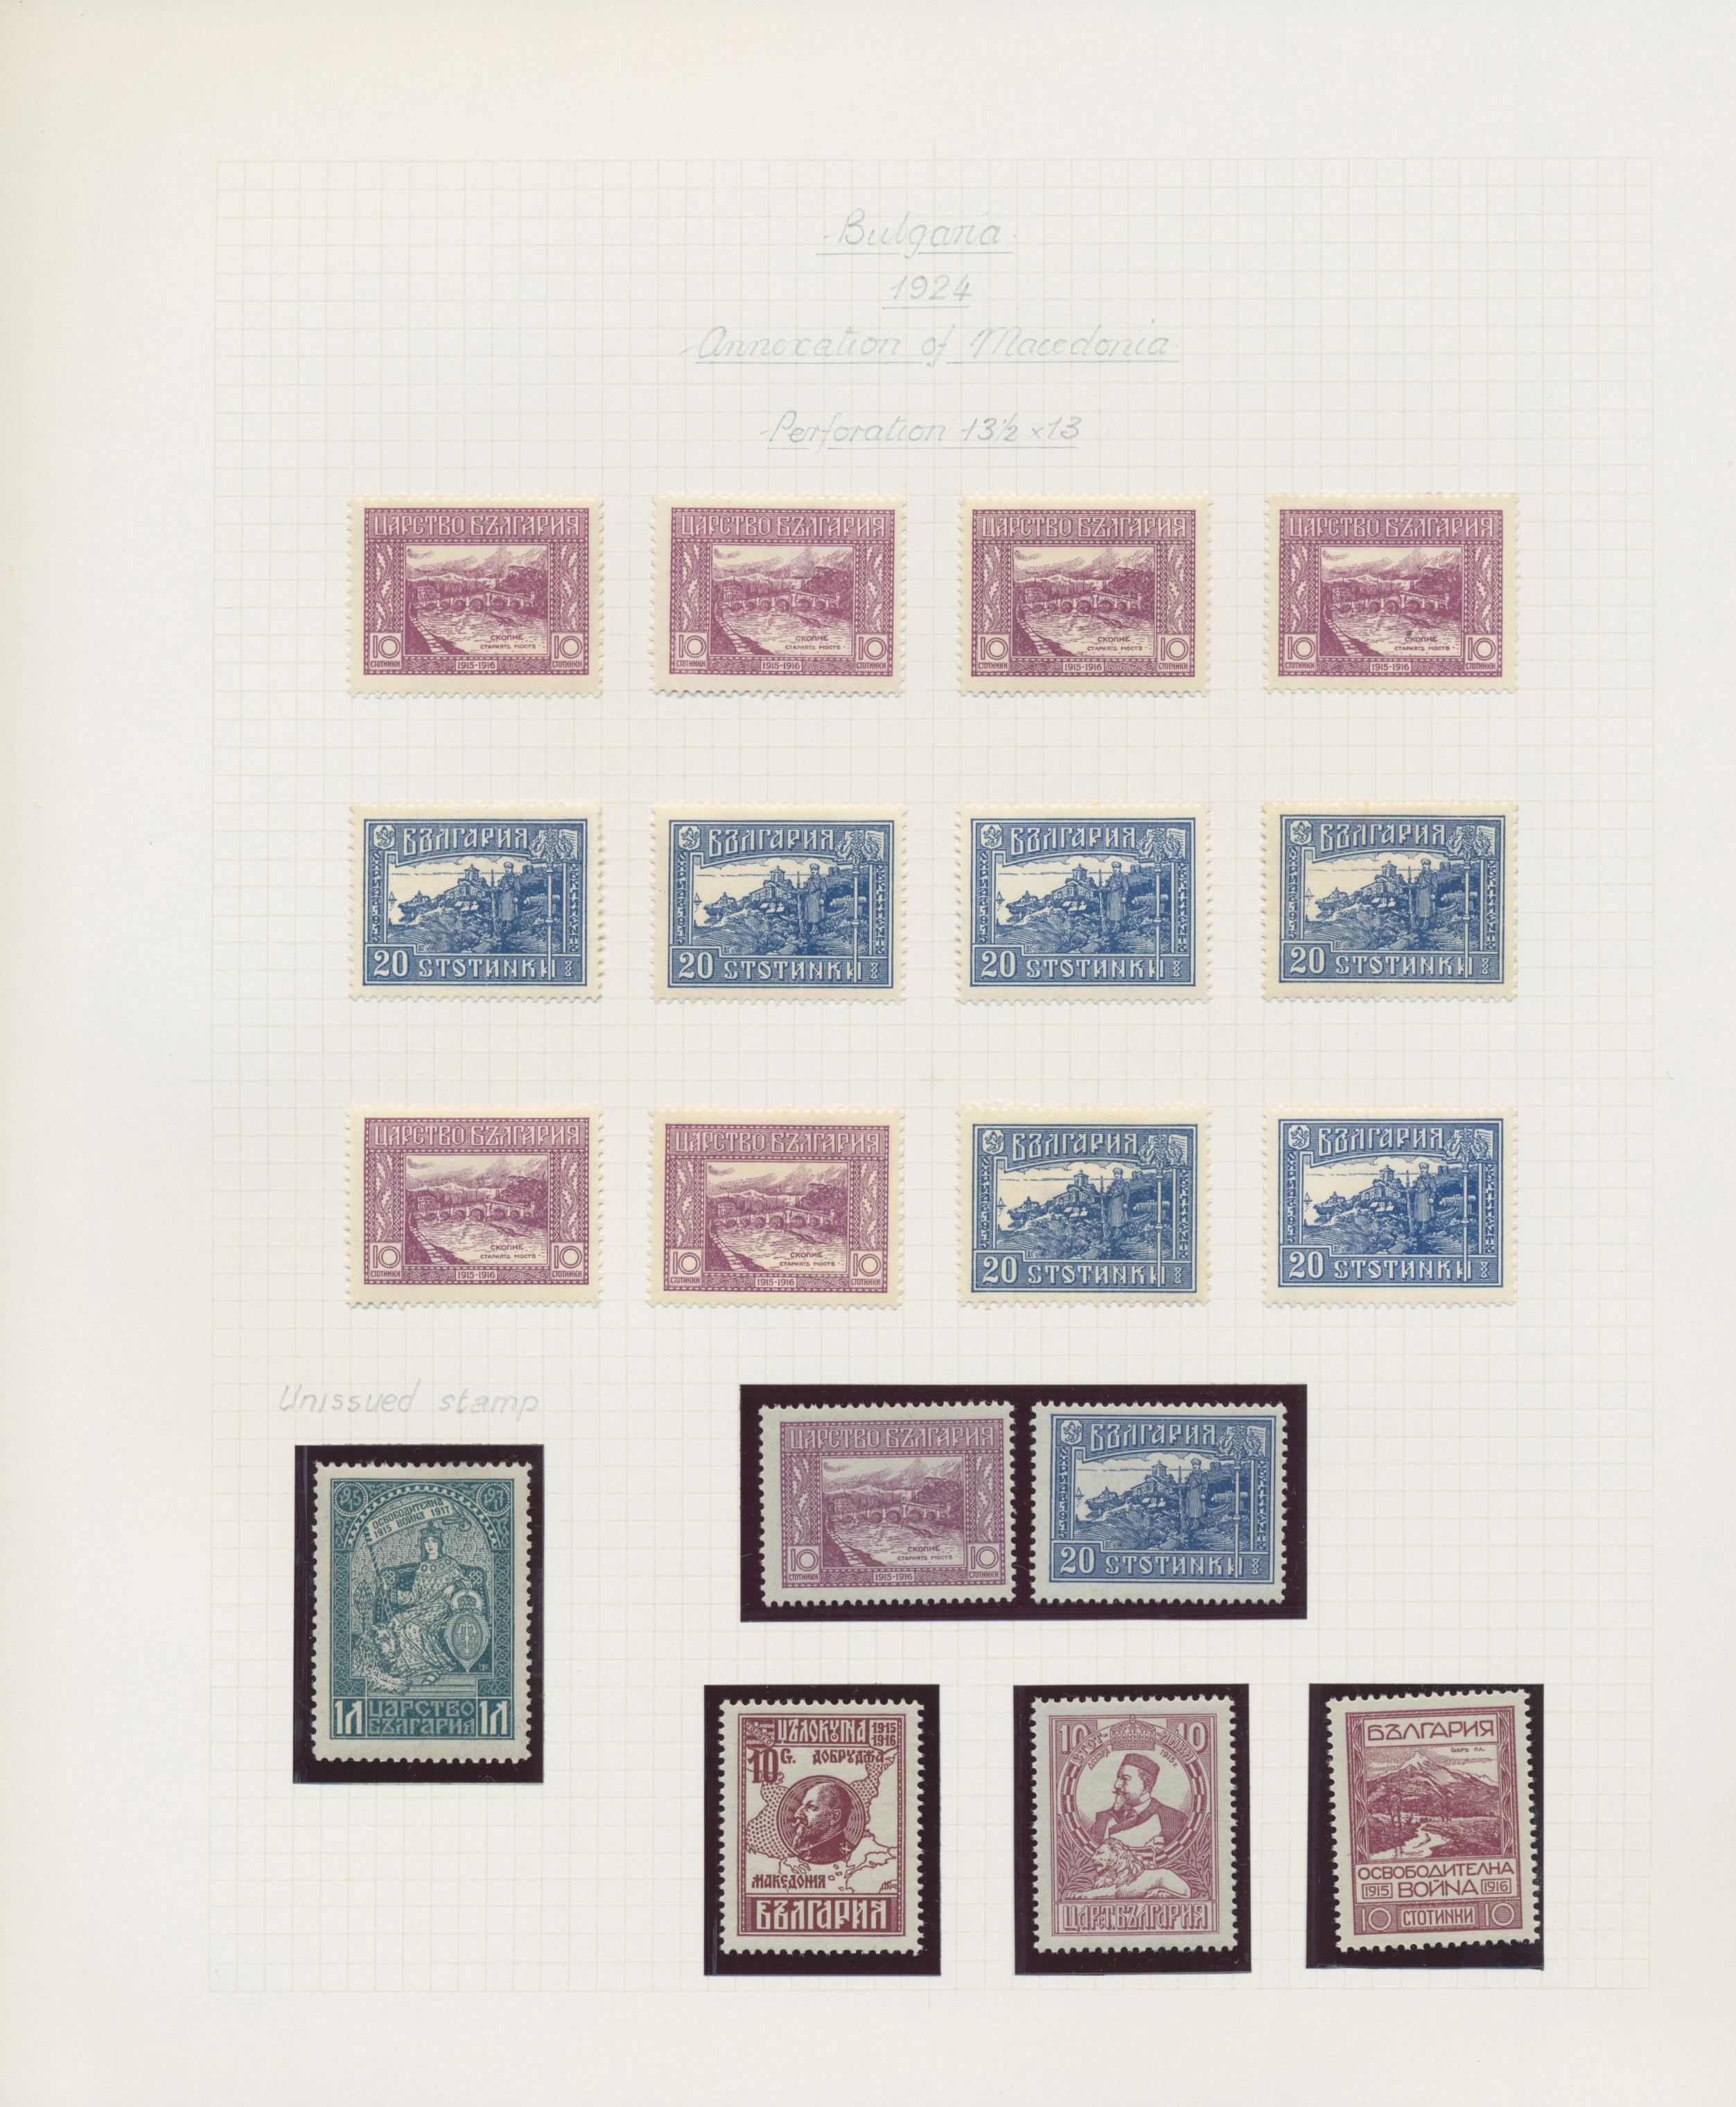 Lot 23768 - bulgarien  -  Auktionshaus Christoph Gärtner GmbH & Co. KG Sale #46 Collections Worldwide